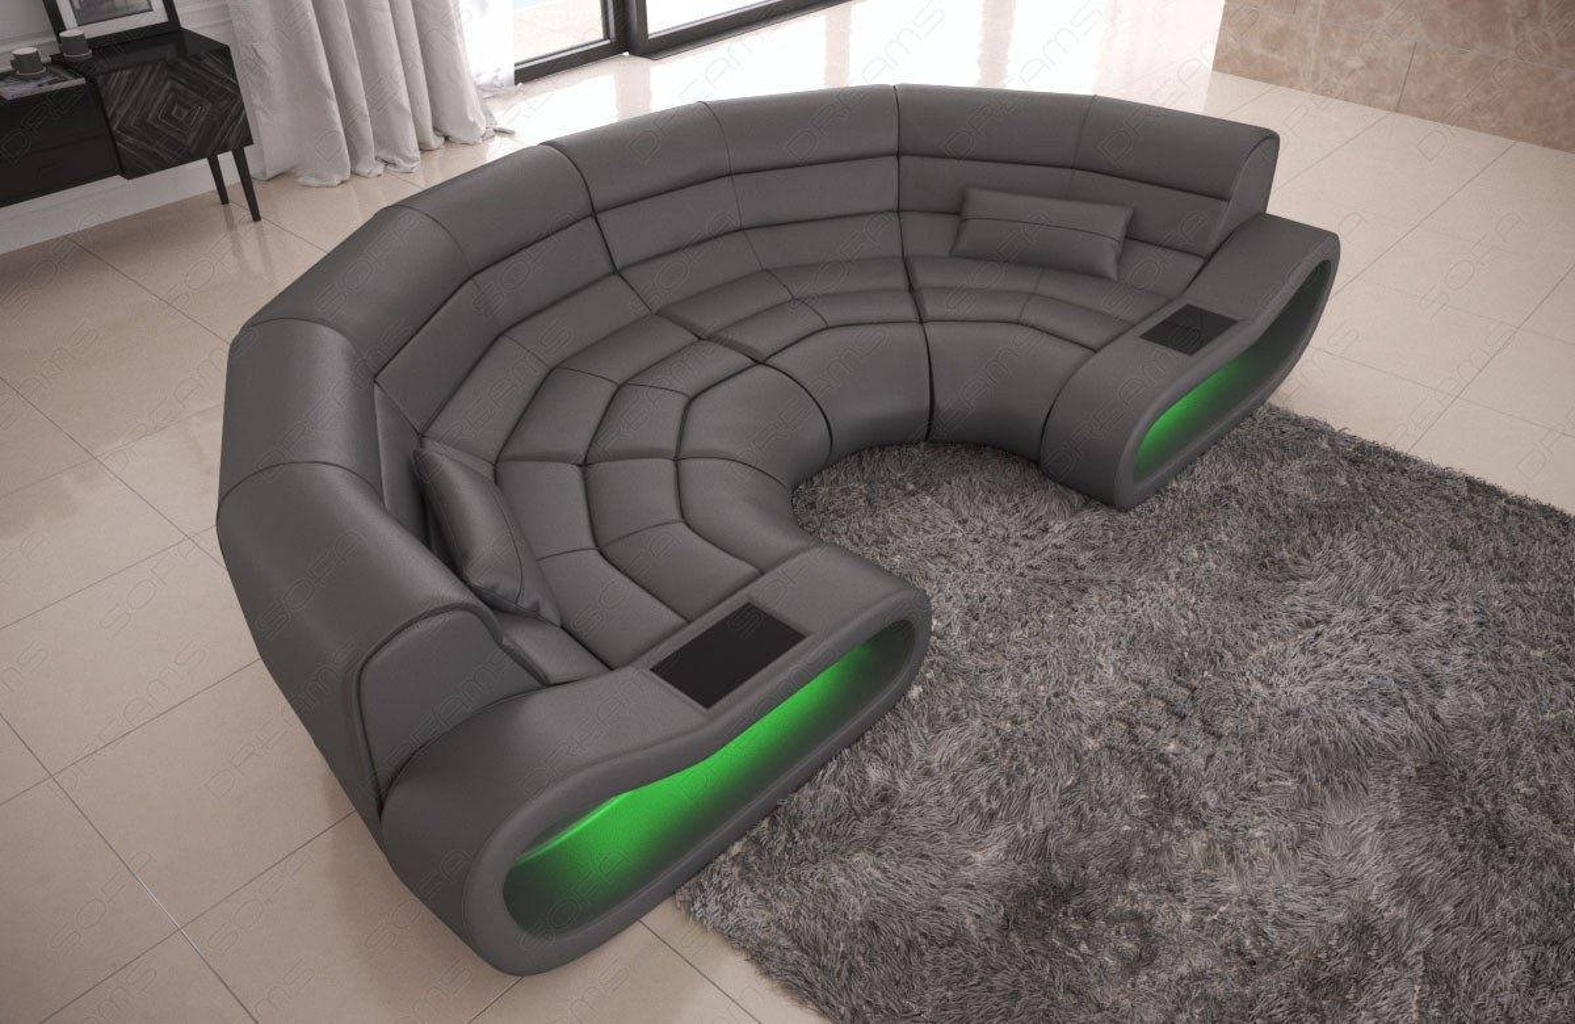 luxury big sofa concept modern design relax couch genuine leather led lights ebay. Black Bedroom Furniture Sets. Home Design Ideas